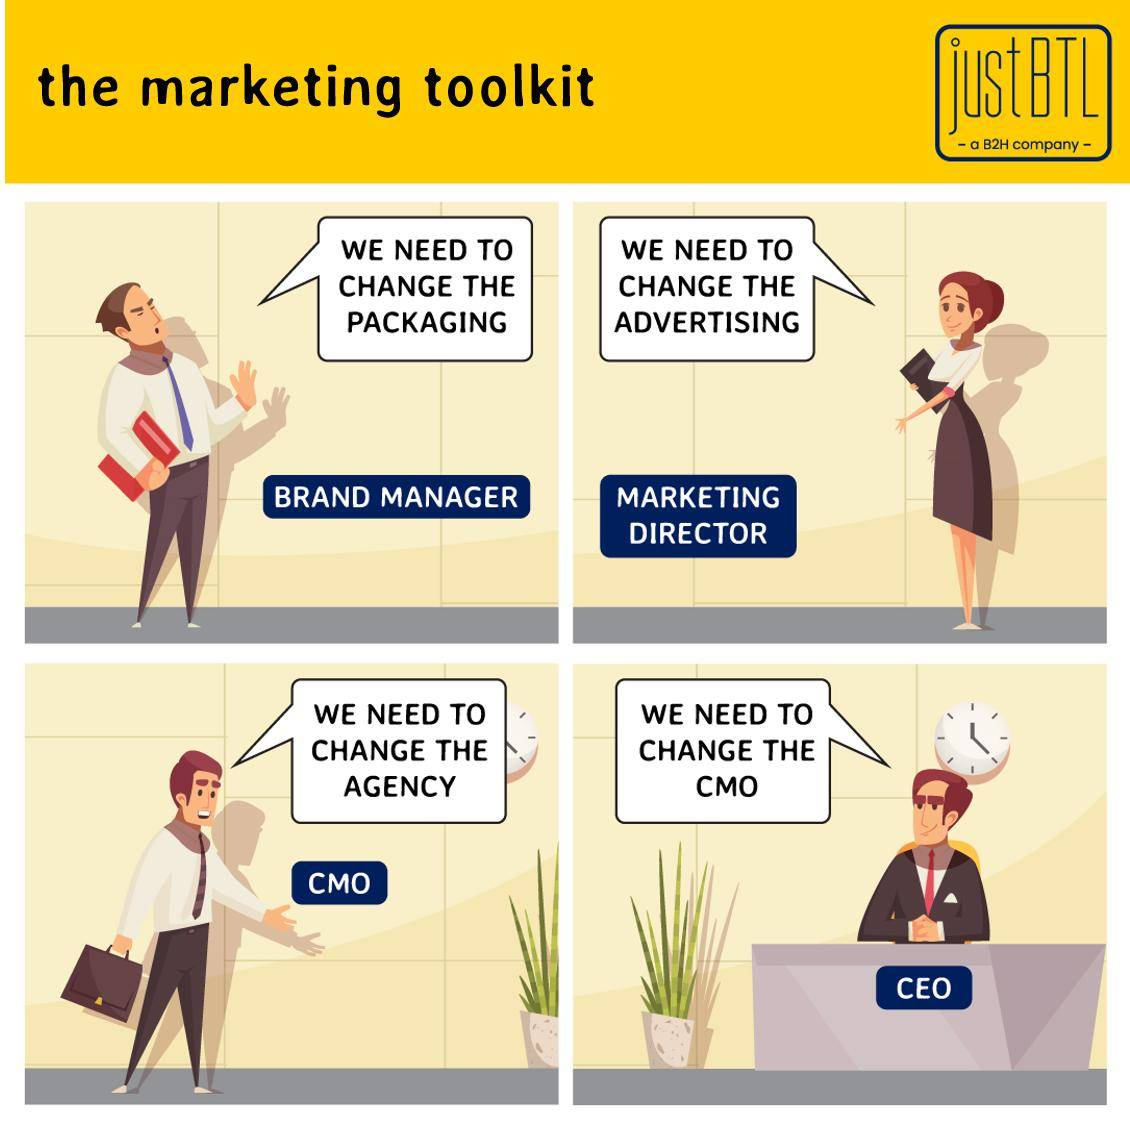 The marketing toolkit